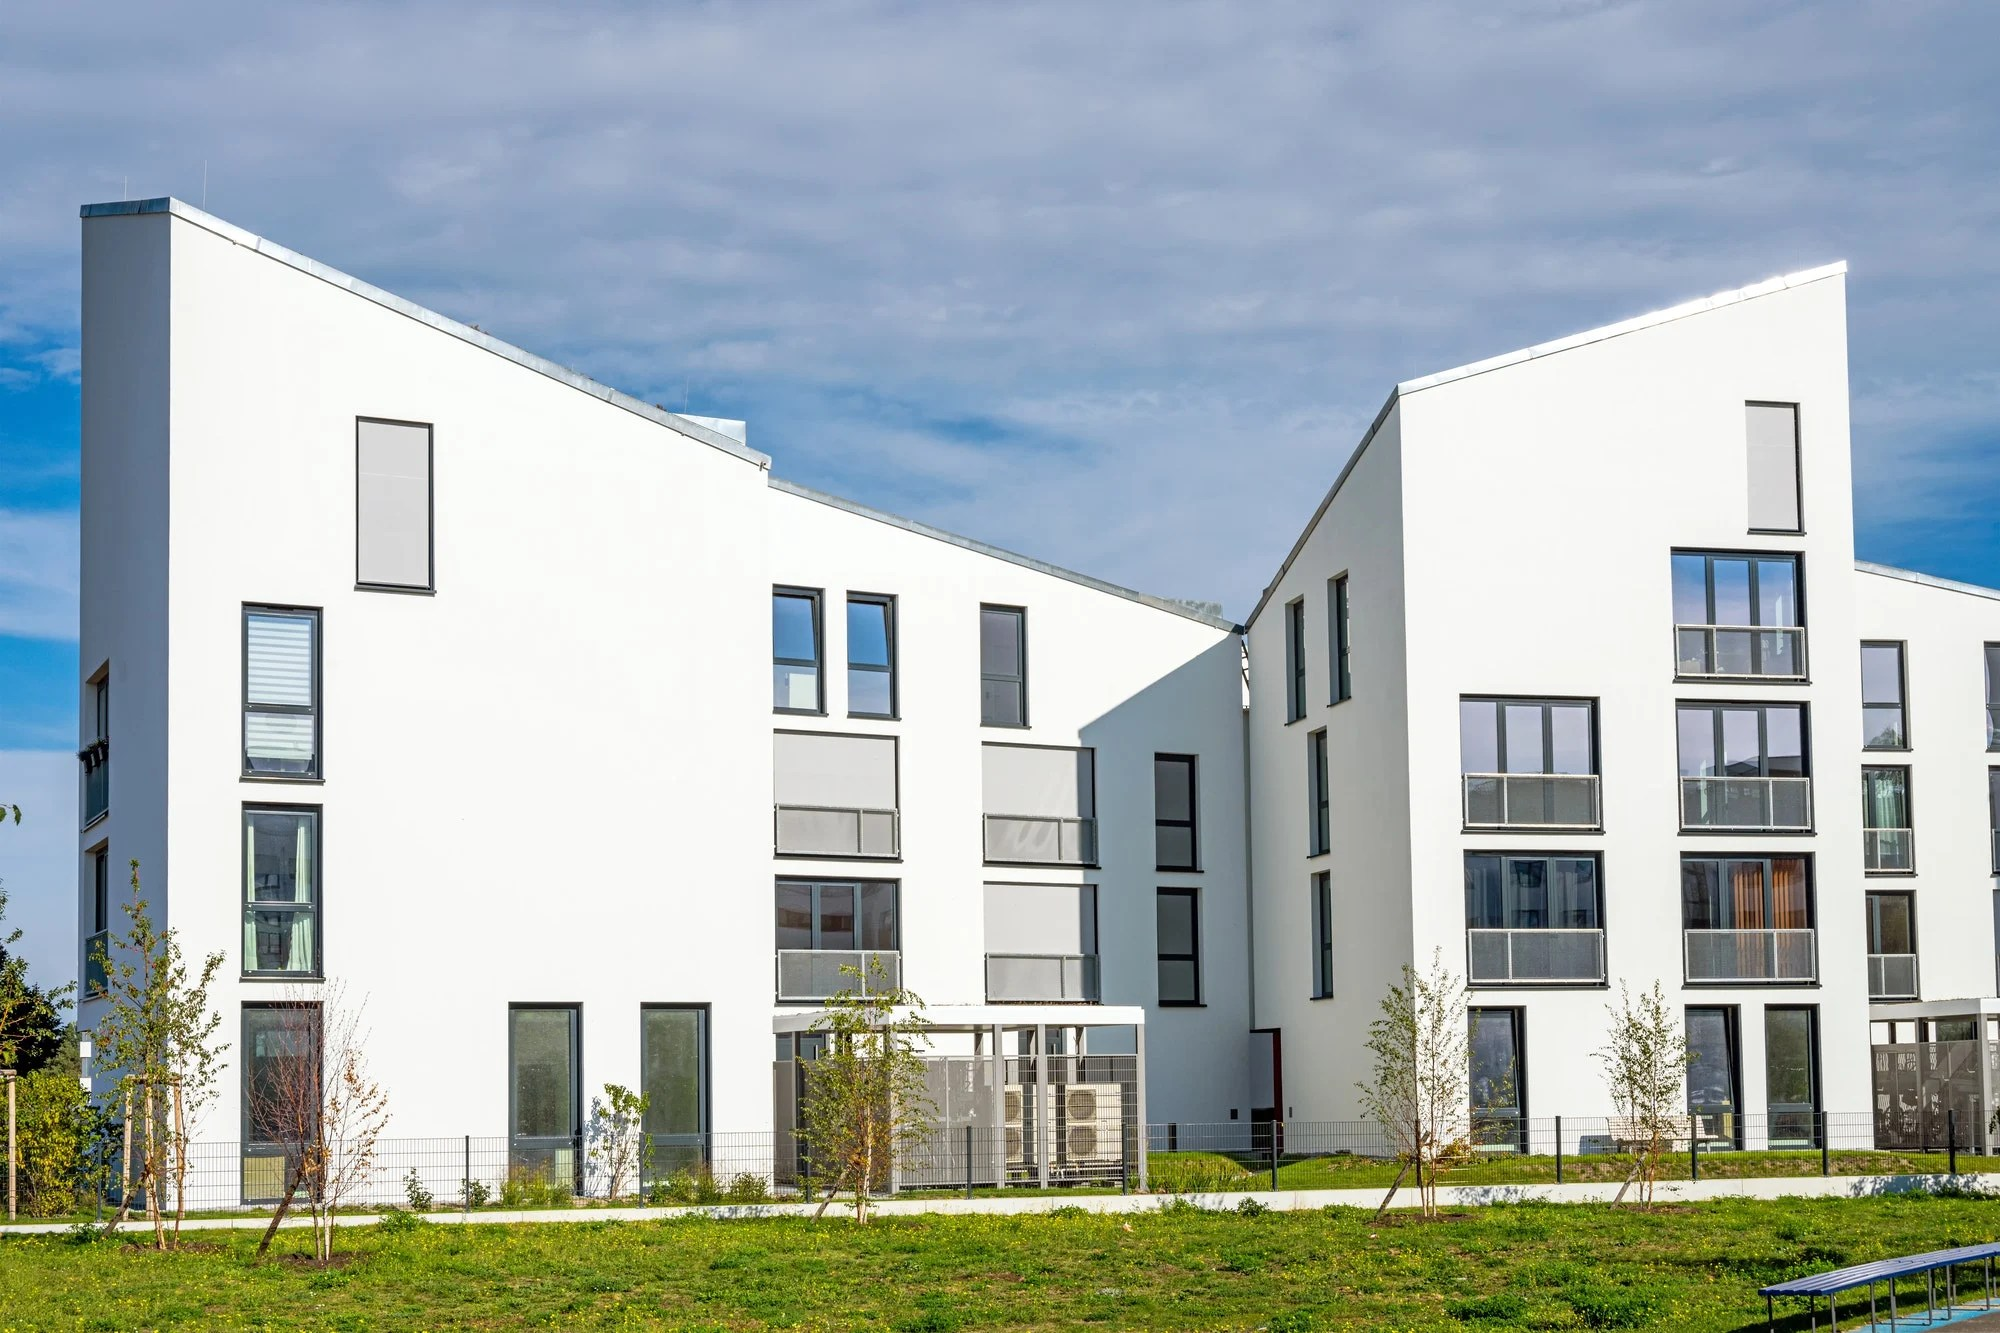 White modern townhouses